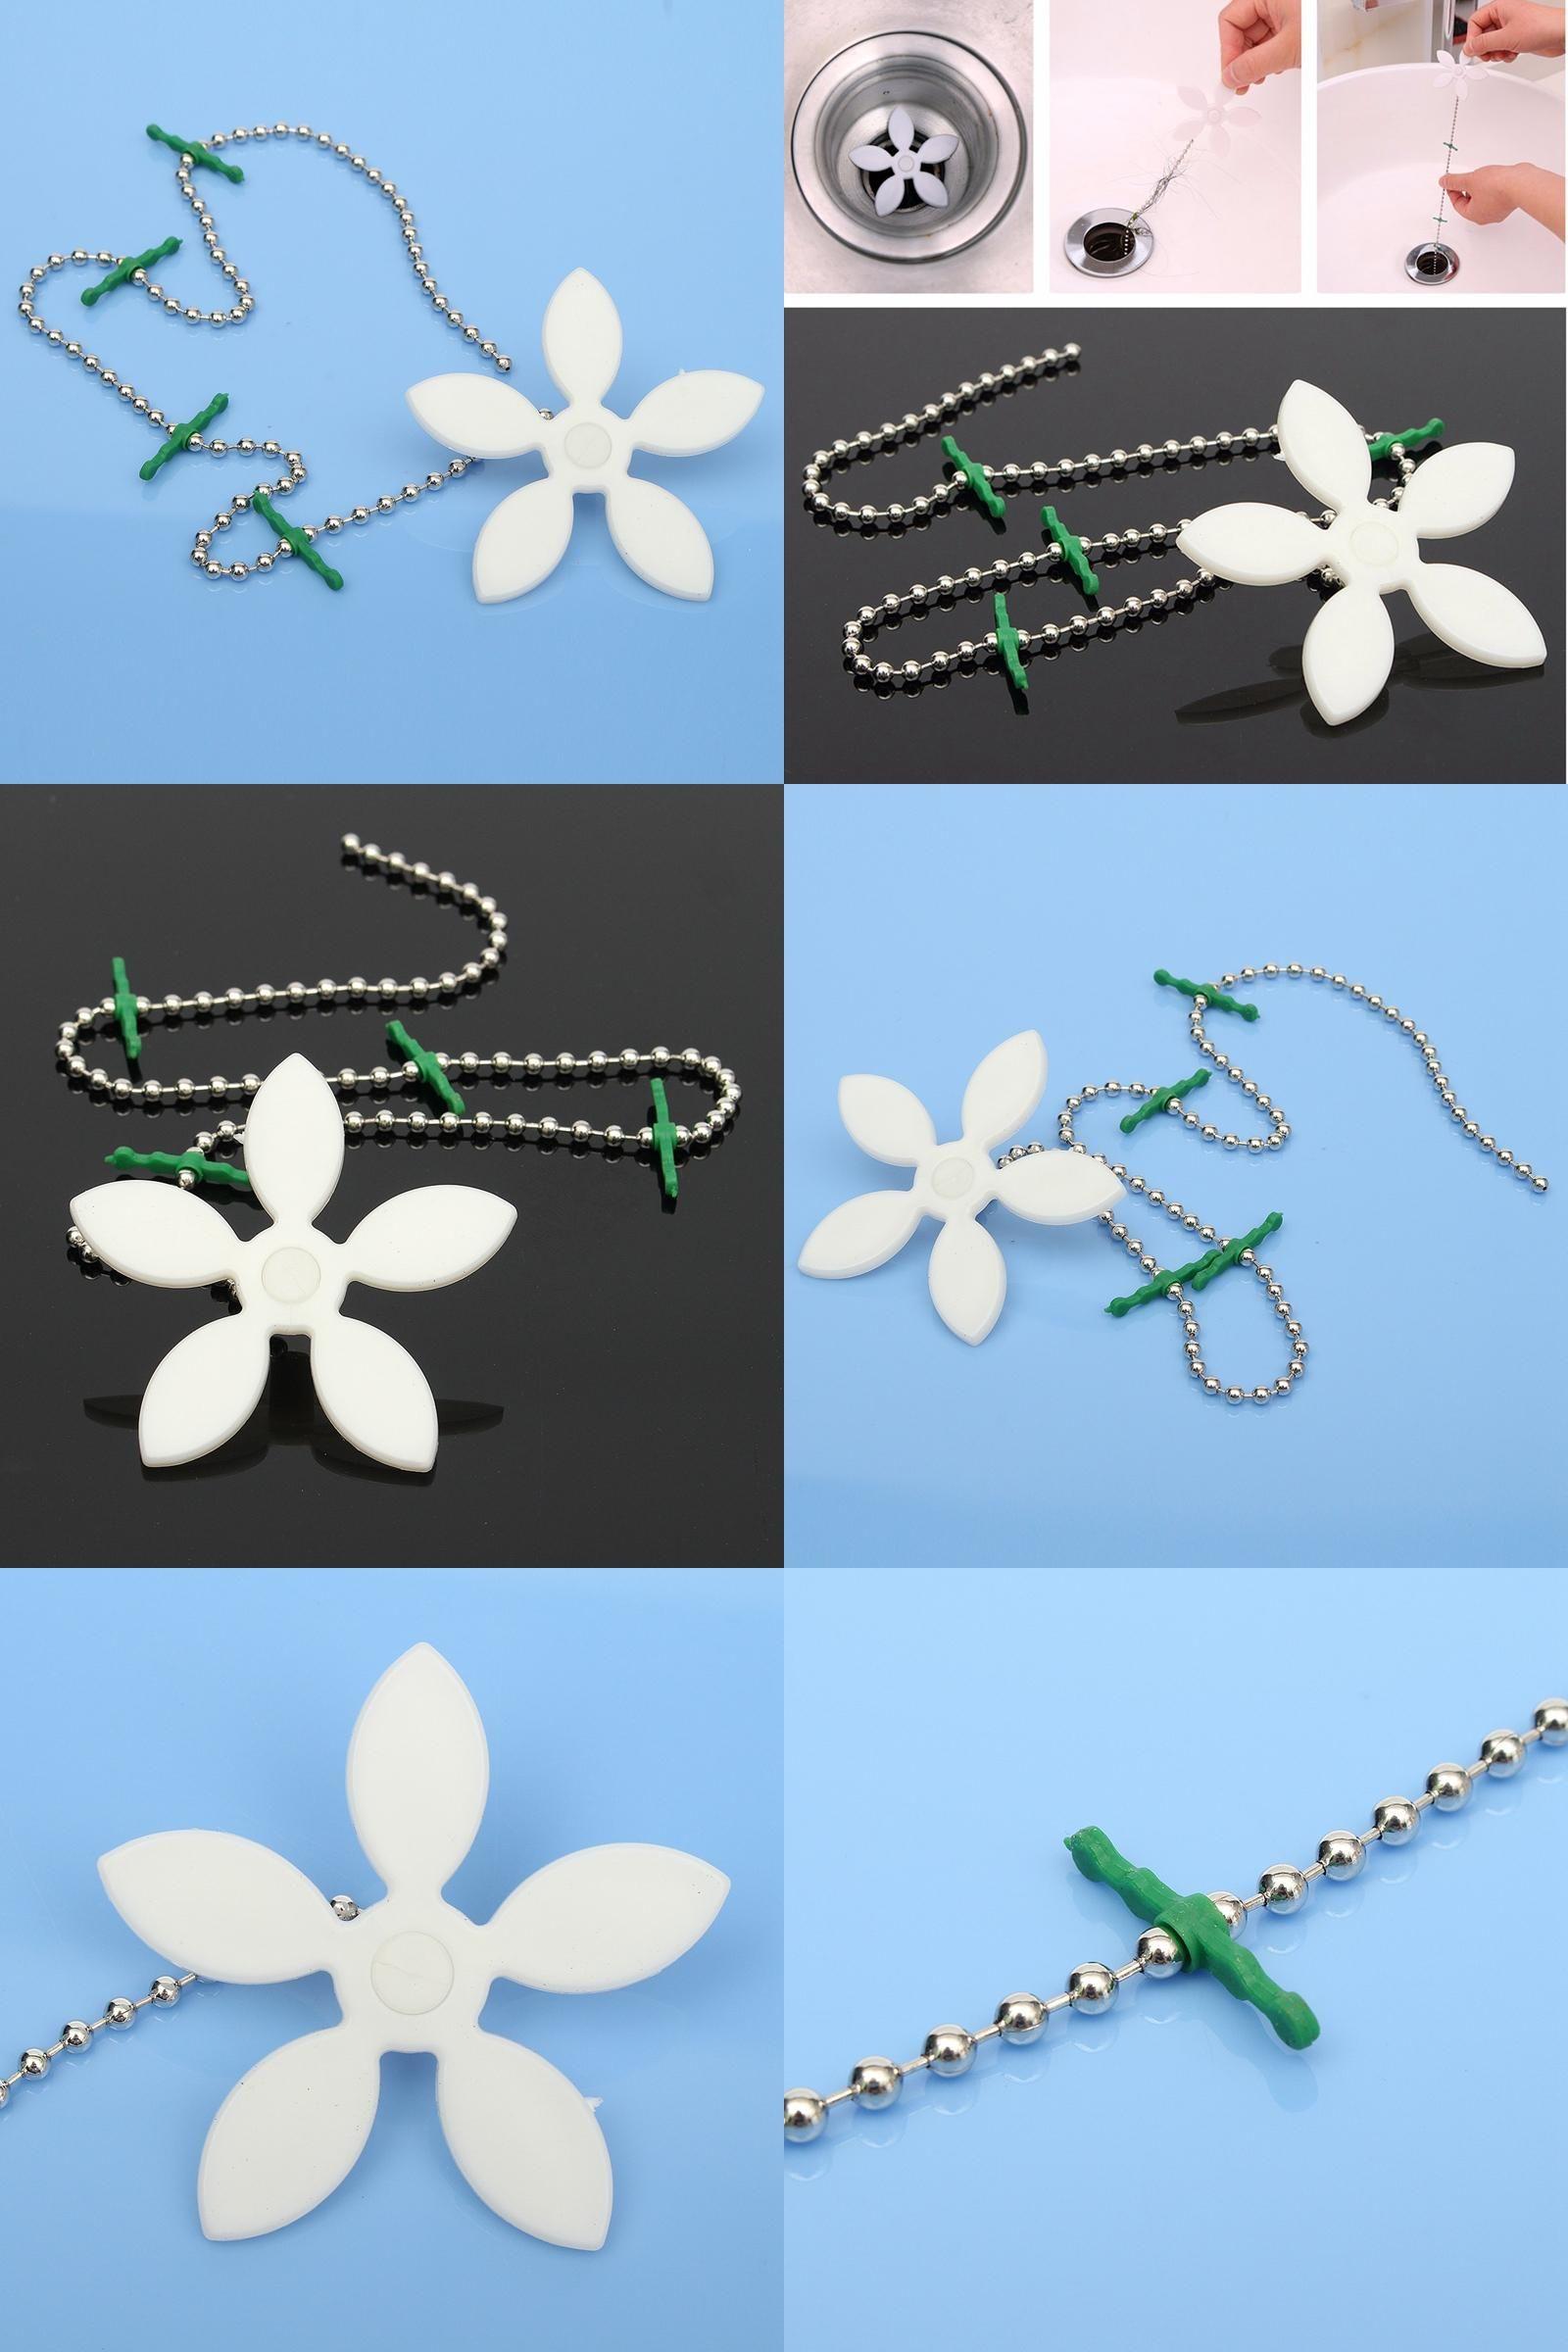 Visit to Buy] Beautiful White Flower Shape Bathtub Drain Cleaner ...